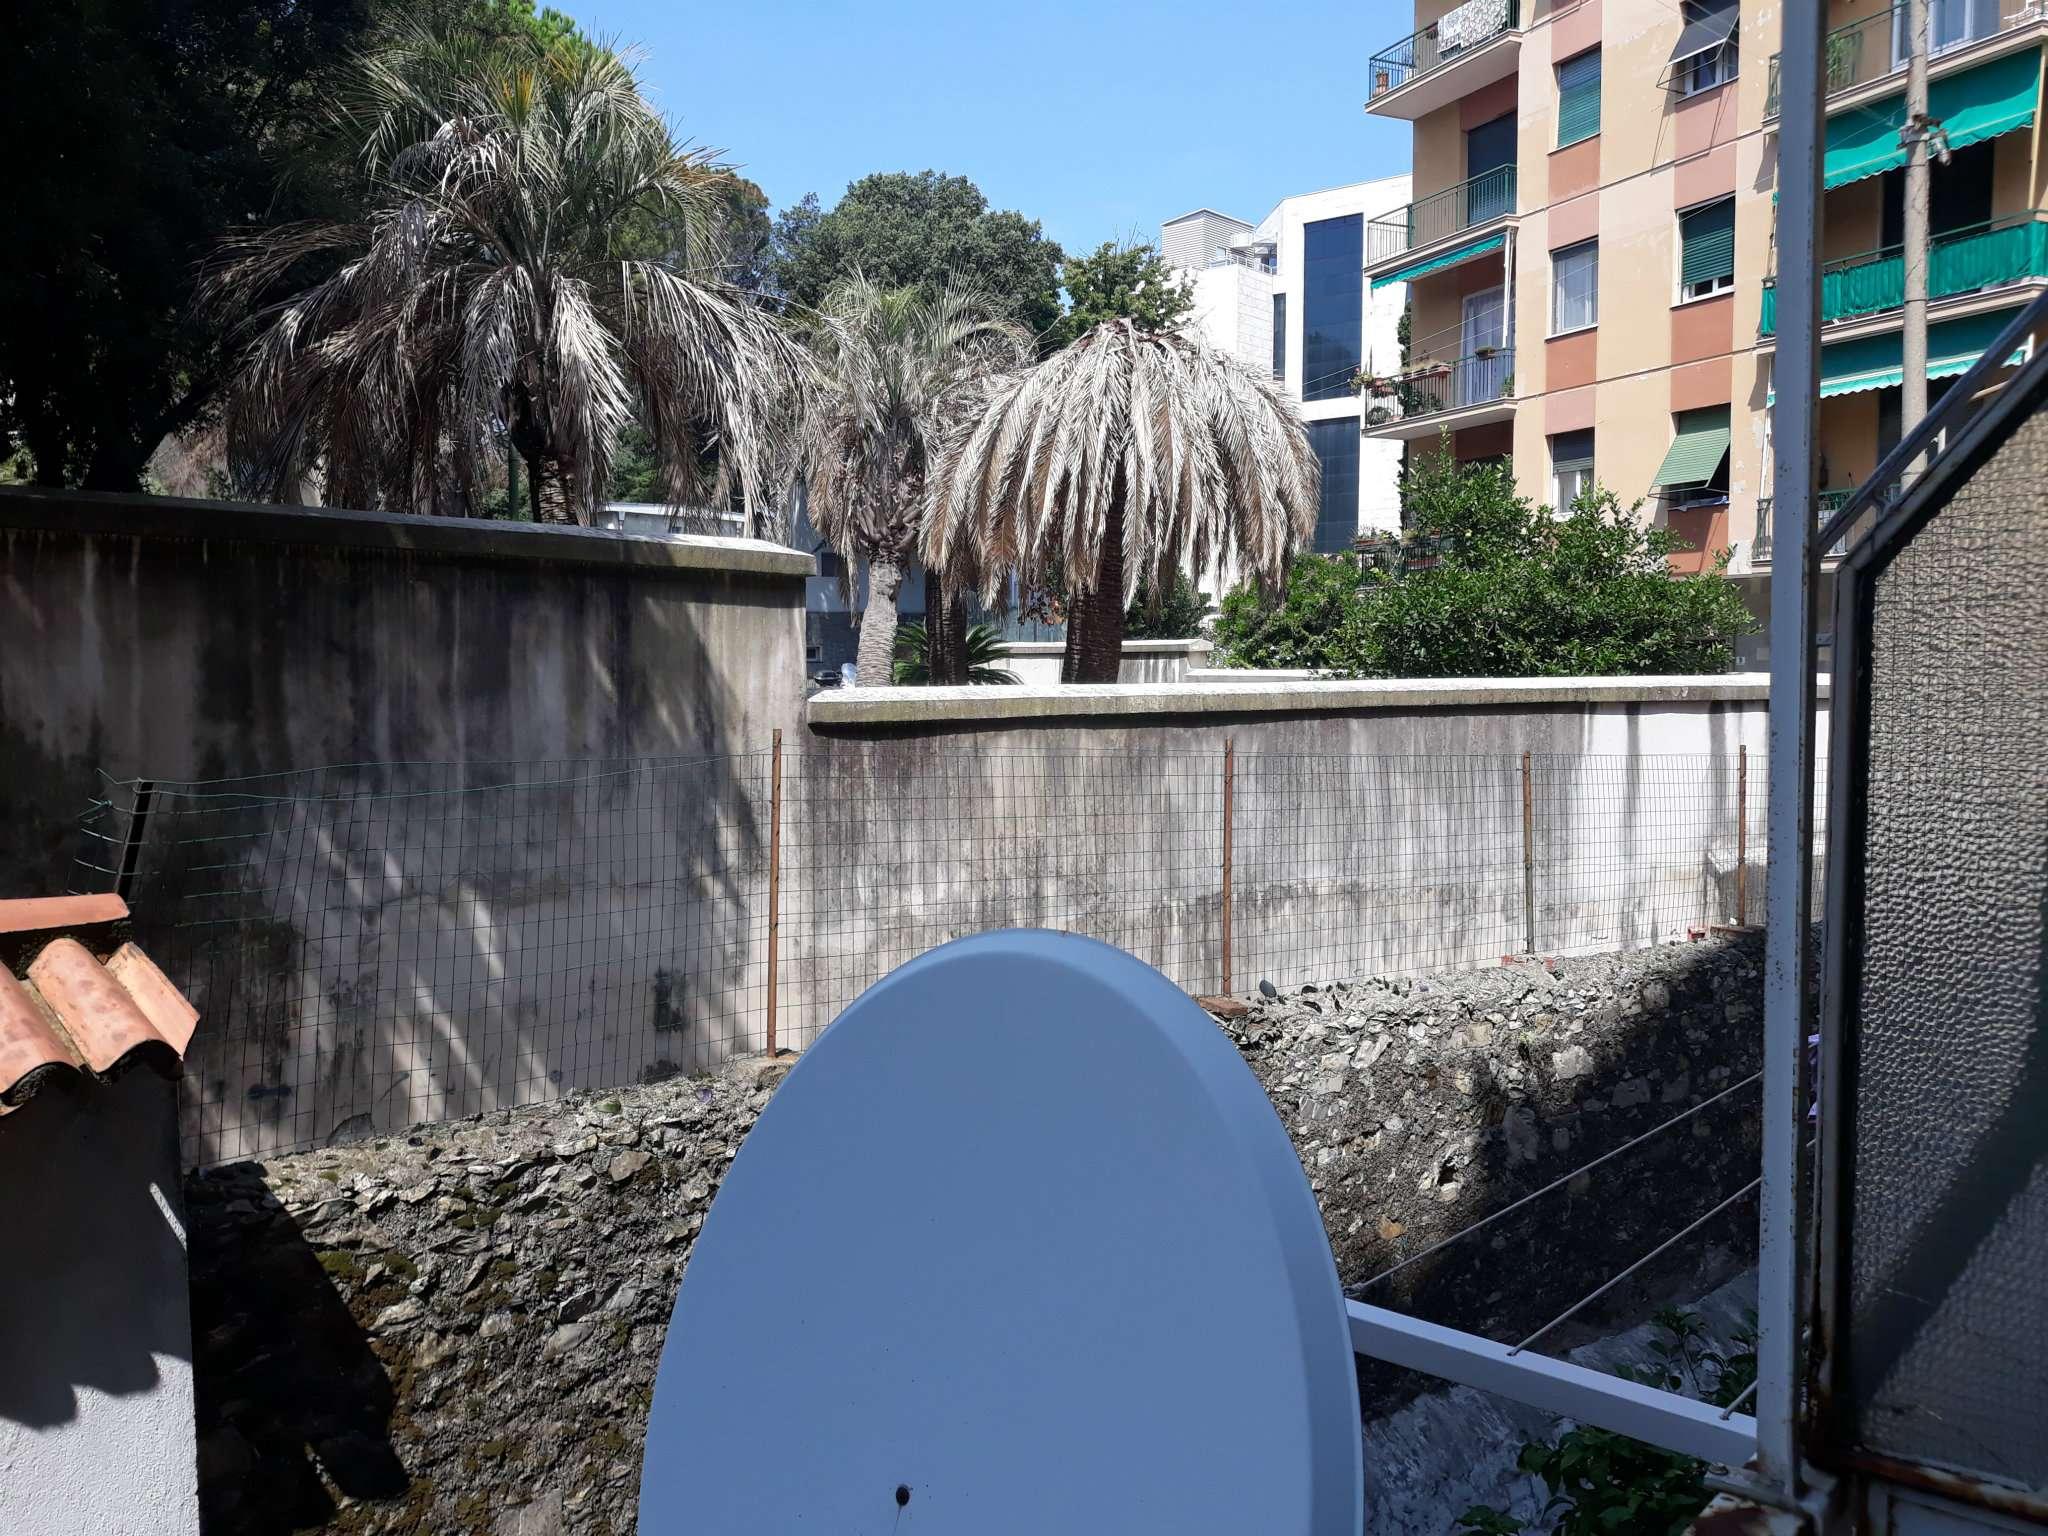 Foto 6 di Bilocale via carrara 128, Genova (zona Boccadasse-Sturla)